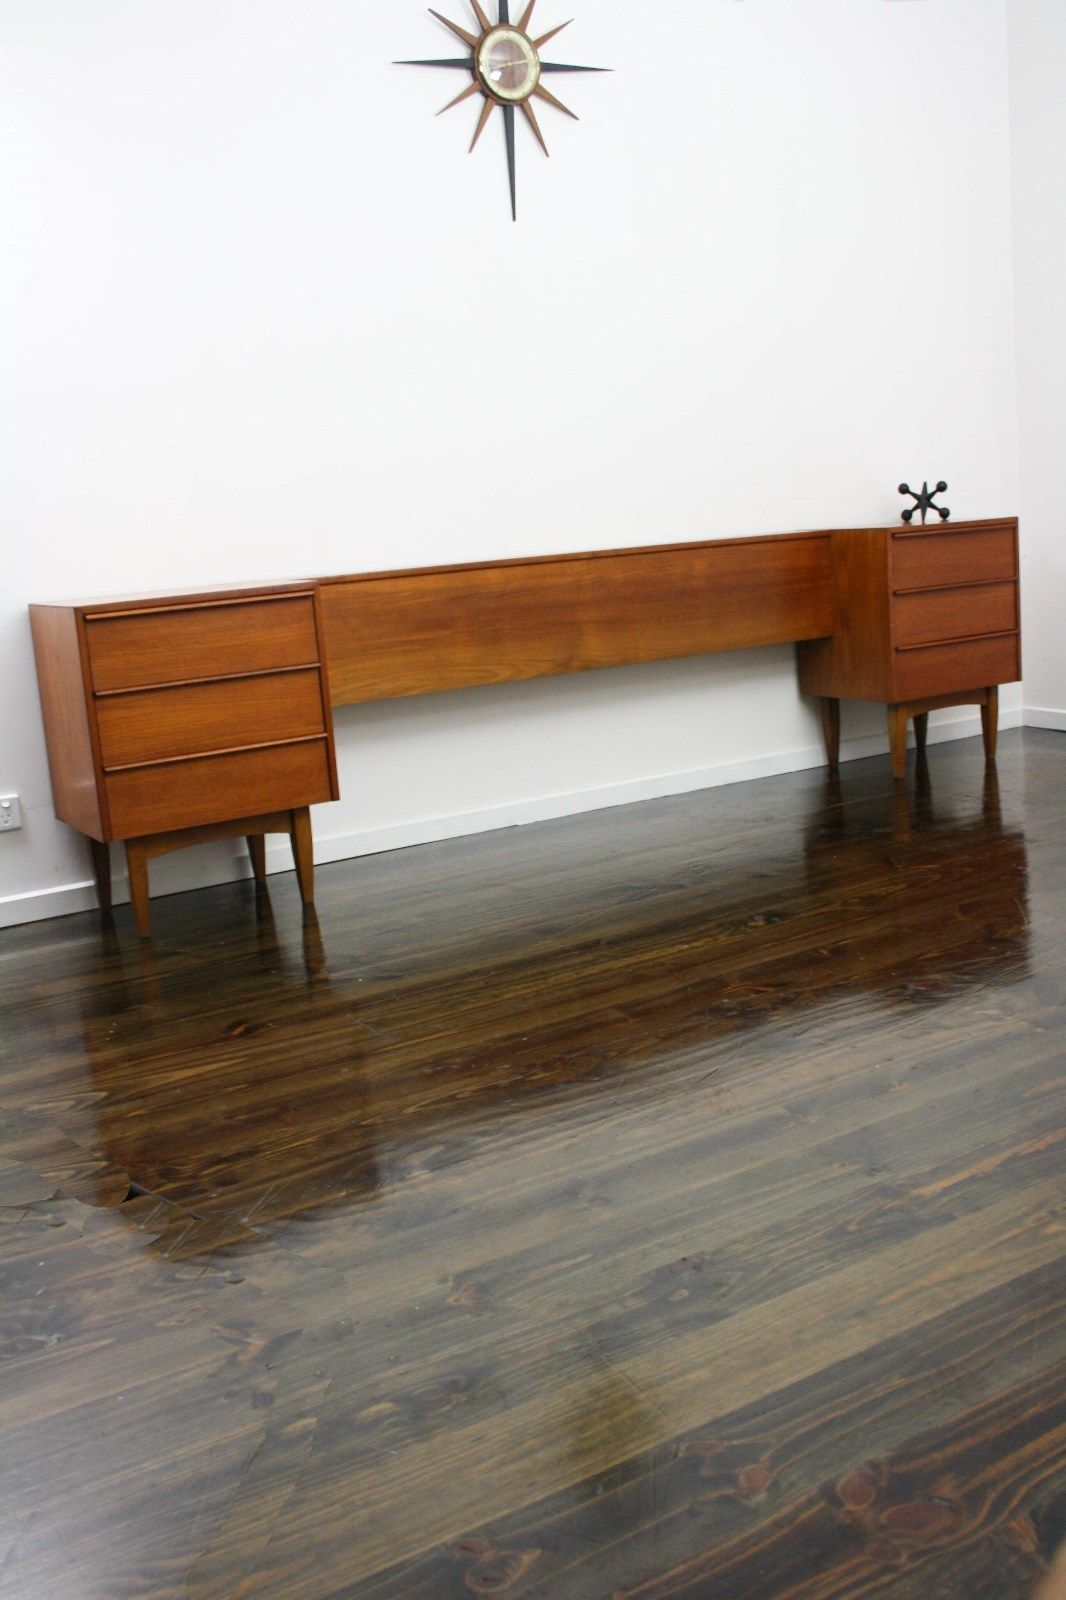 Mid century hans hayson bedside tables drawers qs bedhead retro vintage danish era vic ebay 360 modern furniture